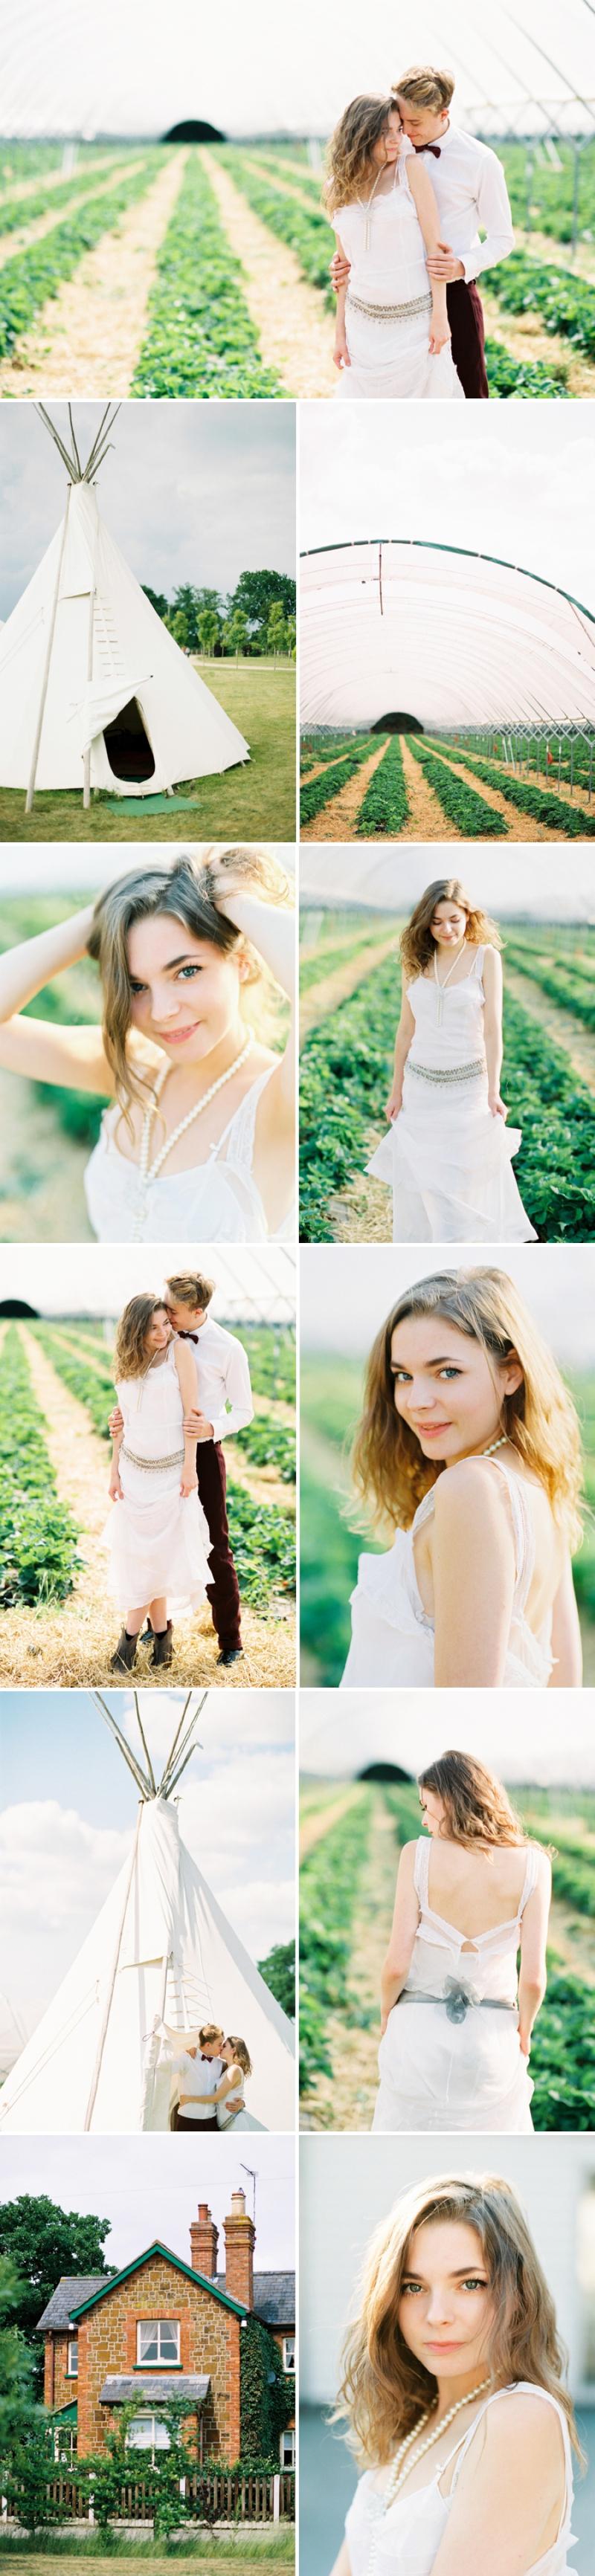 FIND _ Portugal Wedding Photography 1.jpg